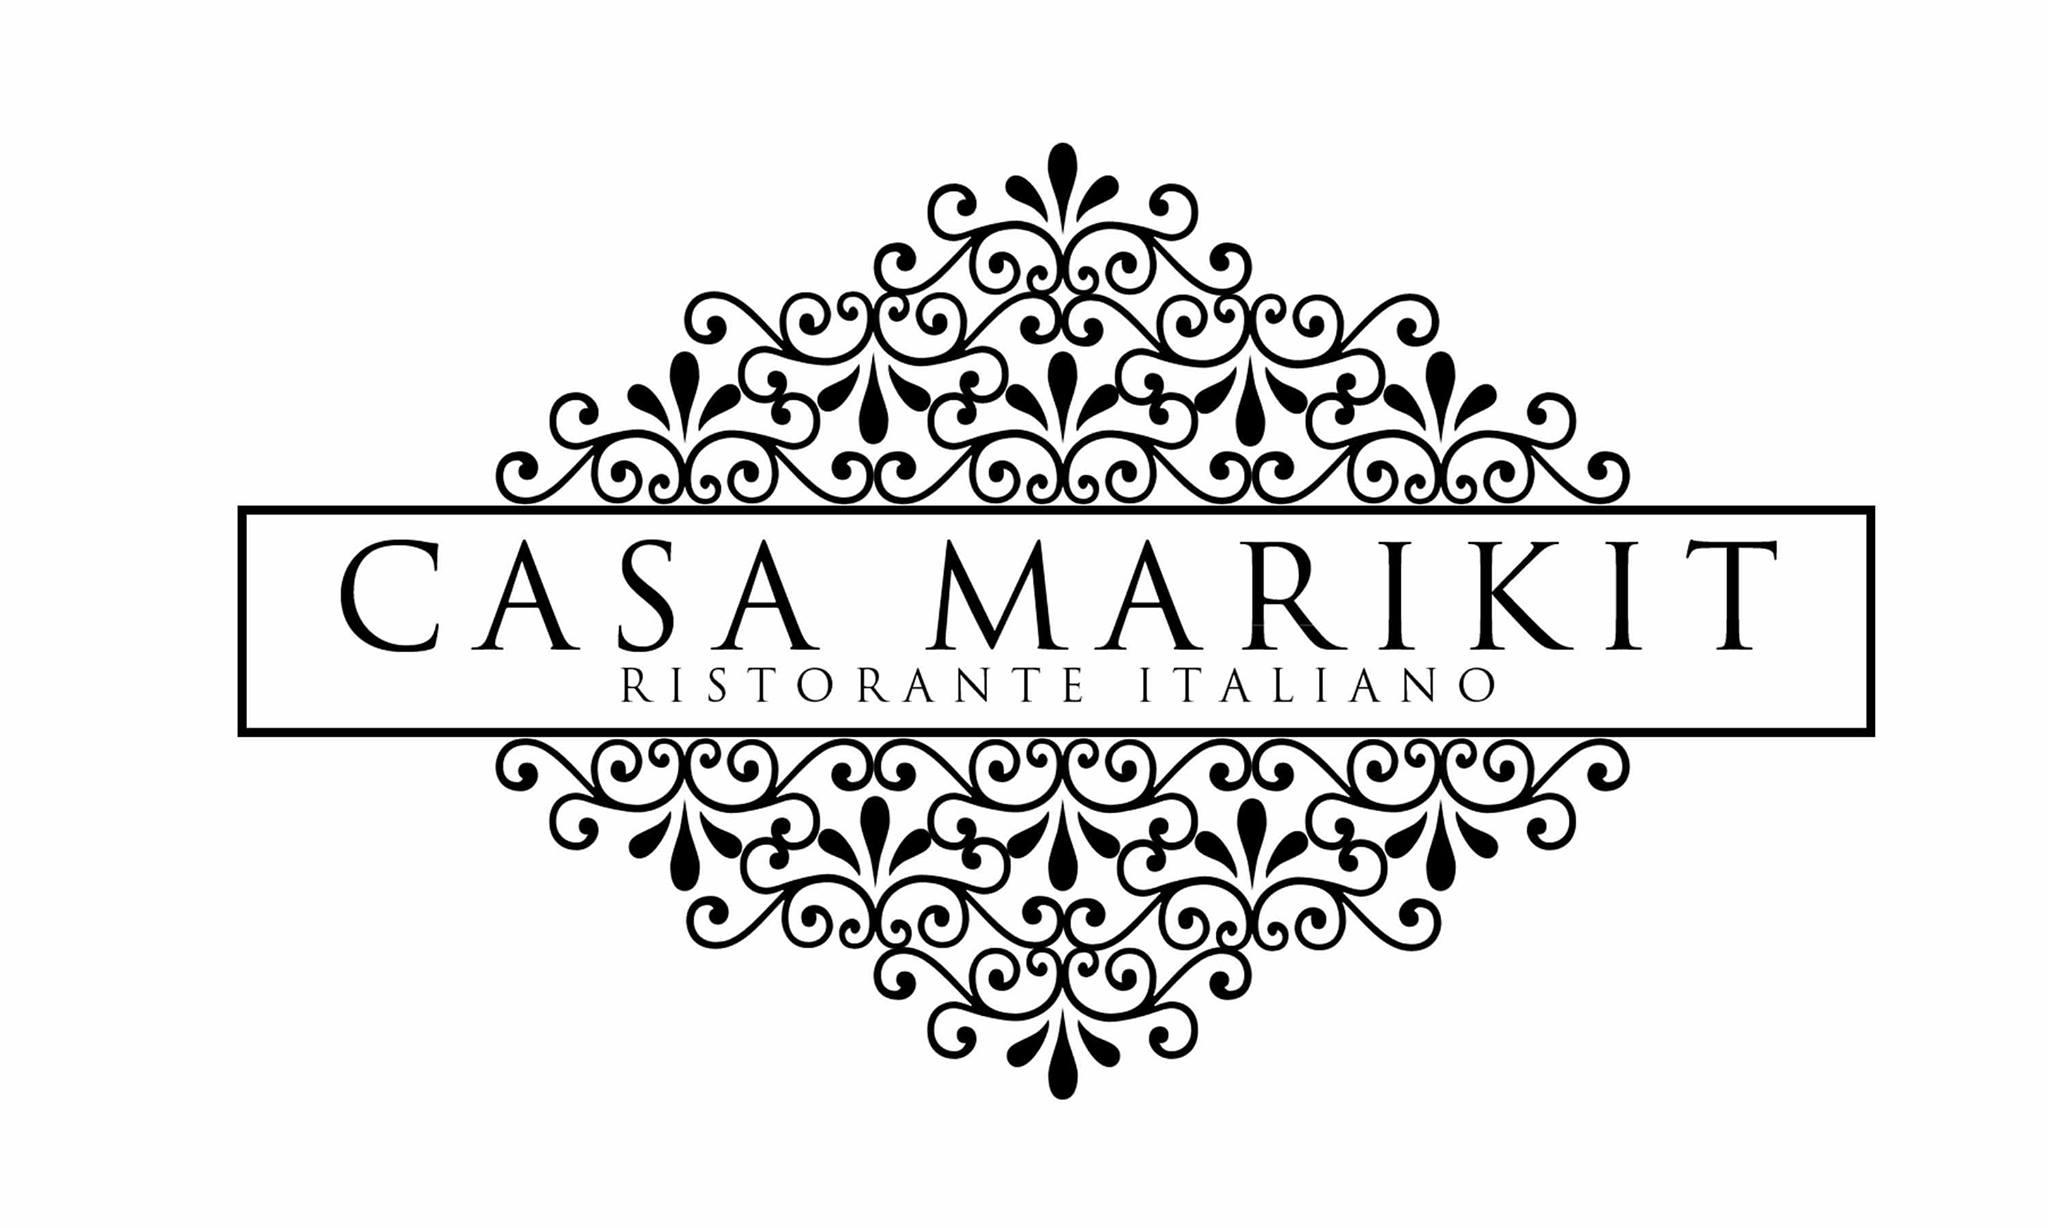 Casa Marikit Ristorante Italiano